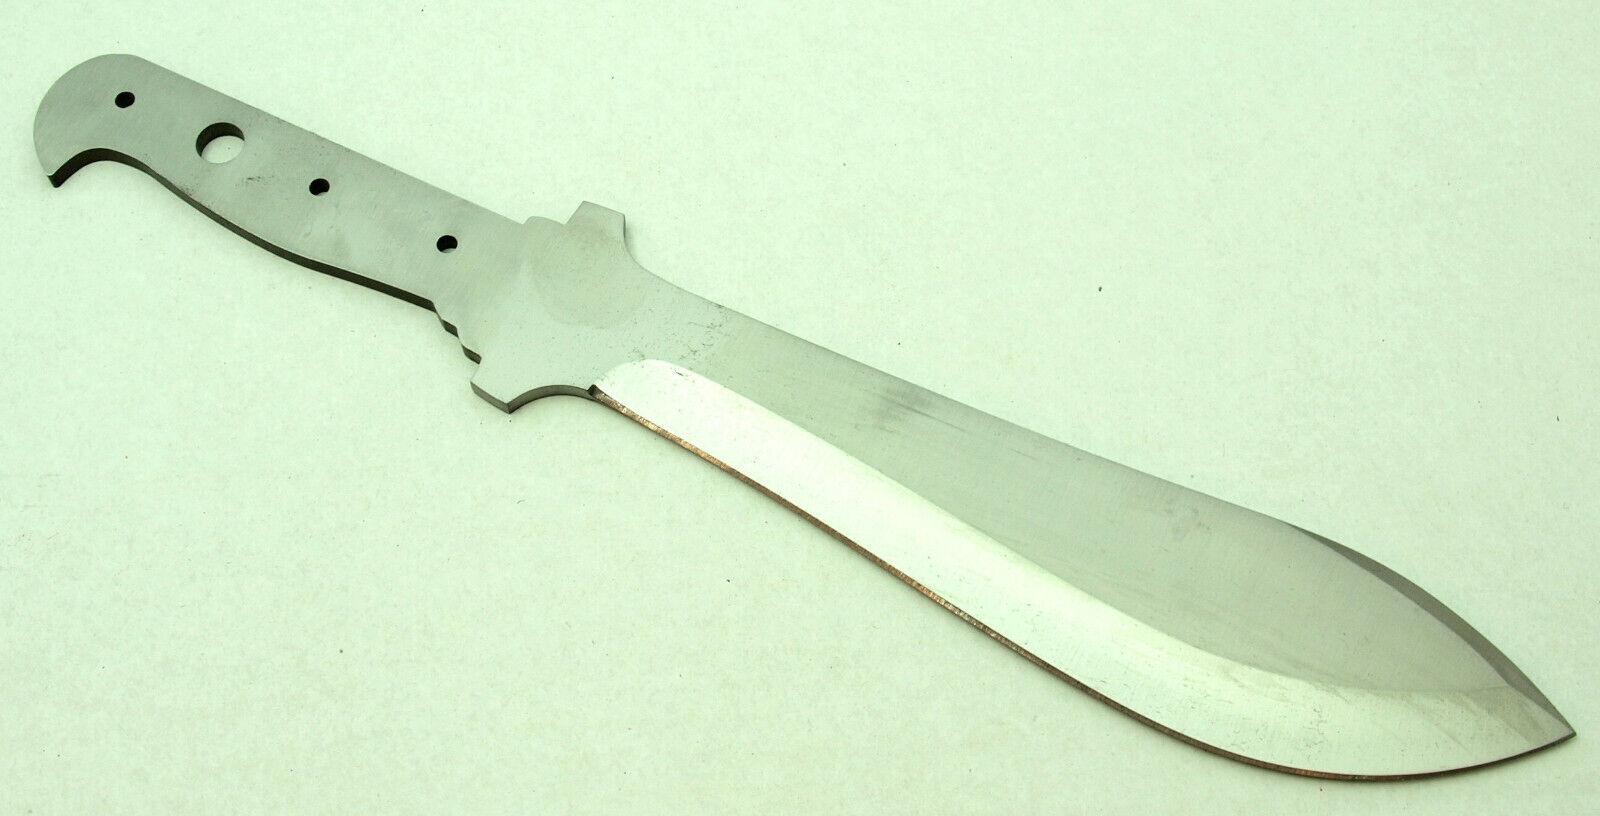 RÜ1 Rohling für Jagdmesser Klinge Klinge Klinge Bowie Messer 5mm  | Sale Deutschland  7fc10c